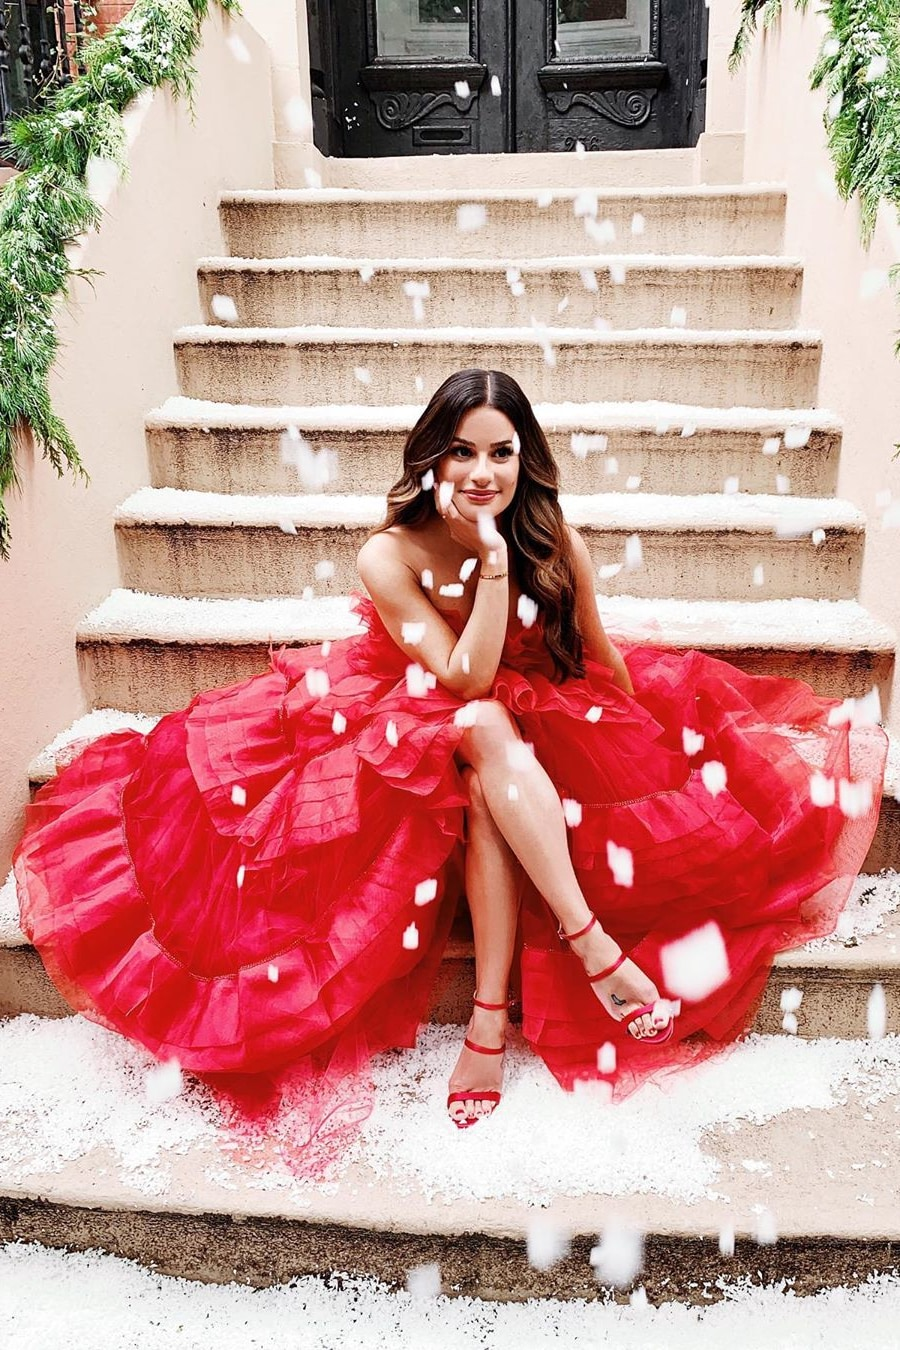 lea-michele-monique-red-dress-red-sandals.jpg